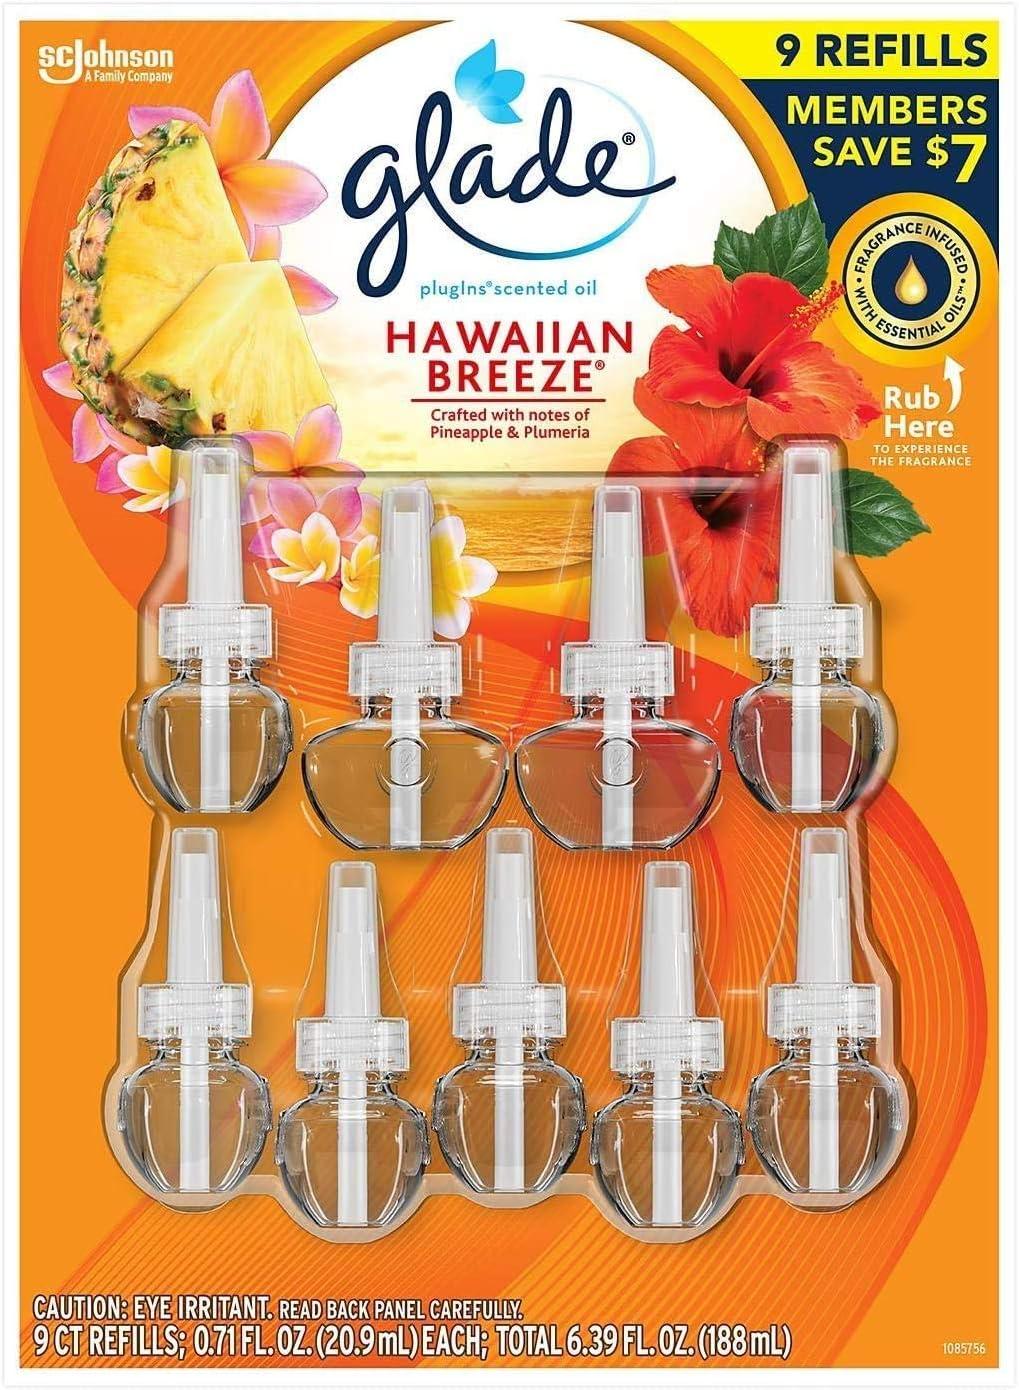 Hawaiin Limited Edition PlugIns Scented Oils Refills 25% More 8 Ct-Hawaiian Breeze, Yellow [Glade]